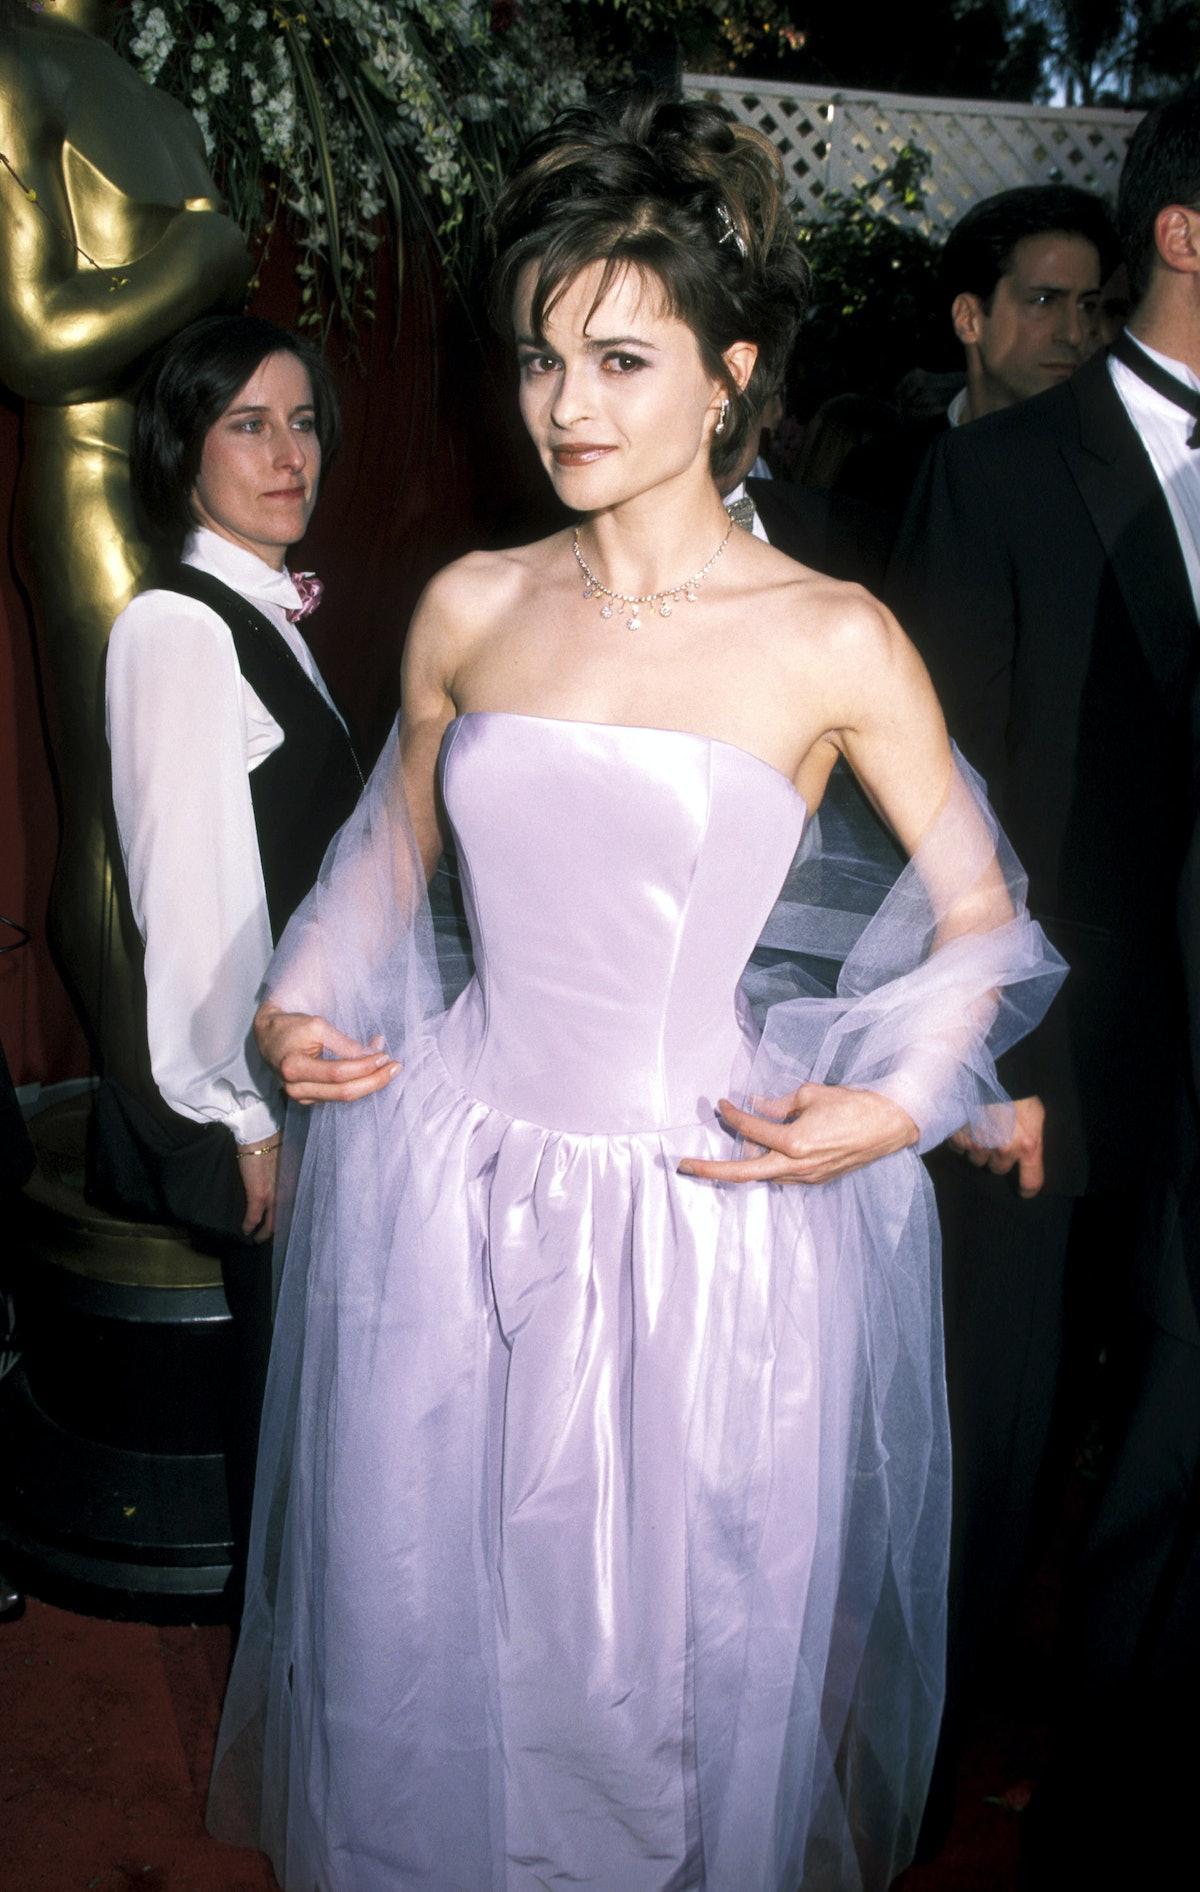 Helena Bonham Carter at the Oscars